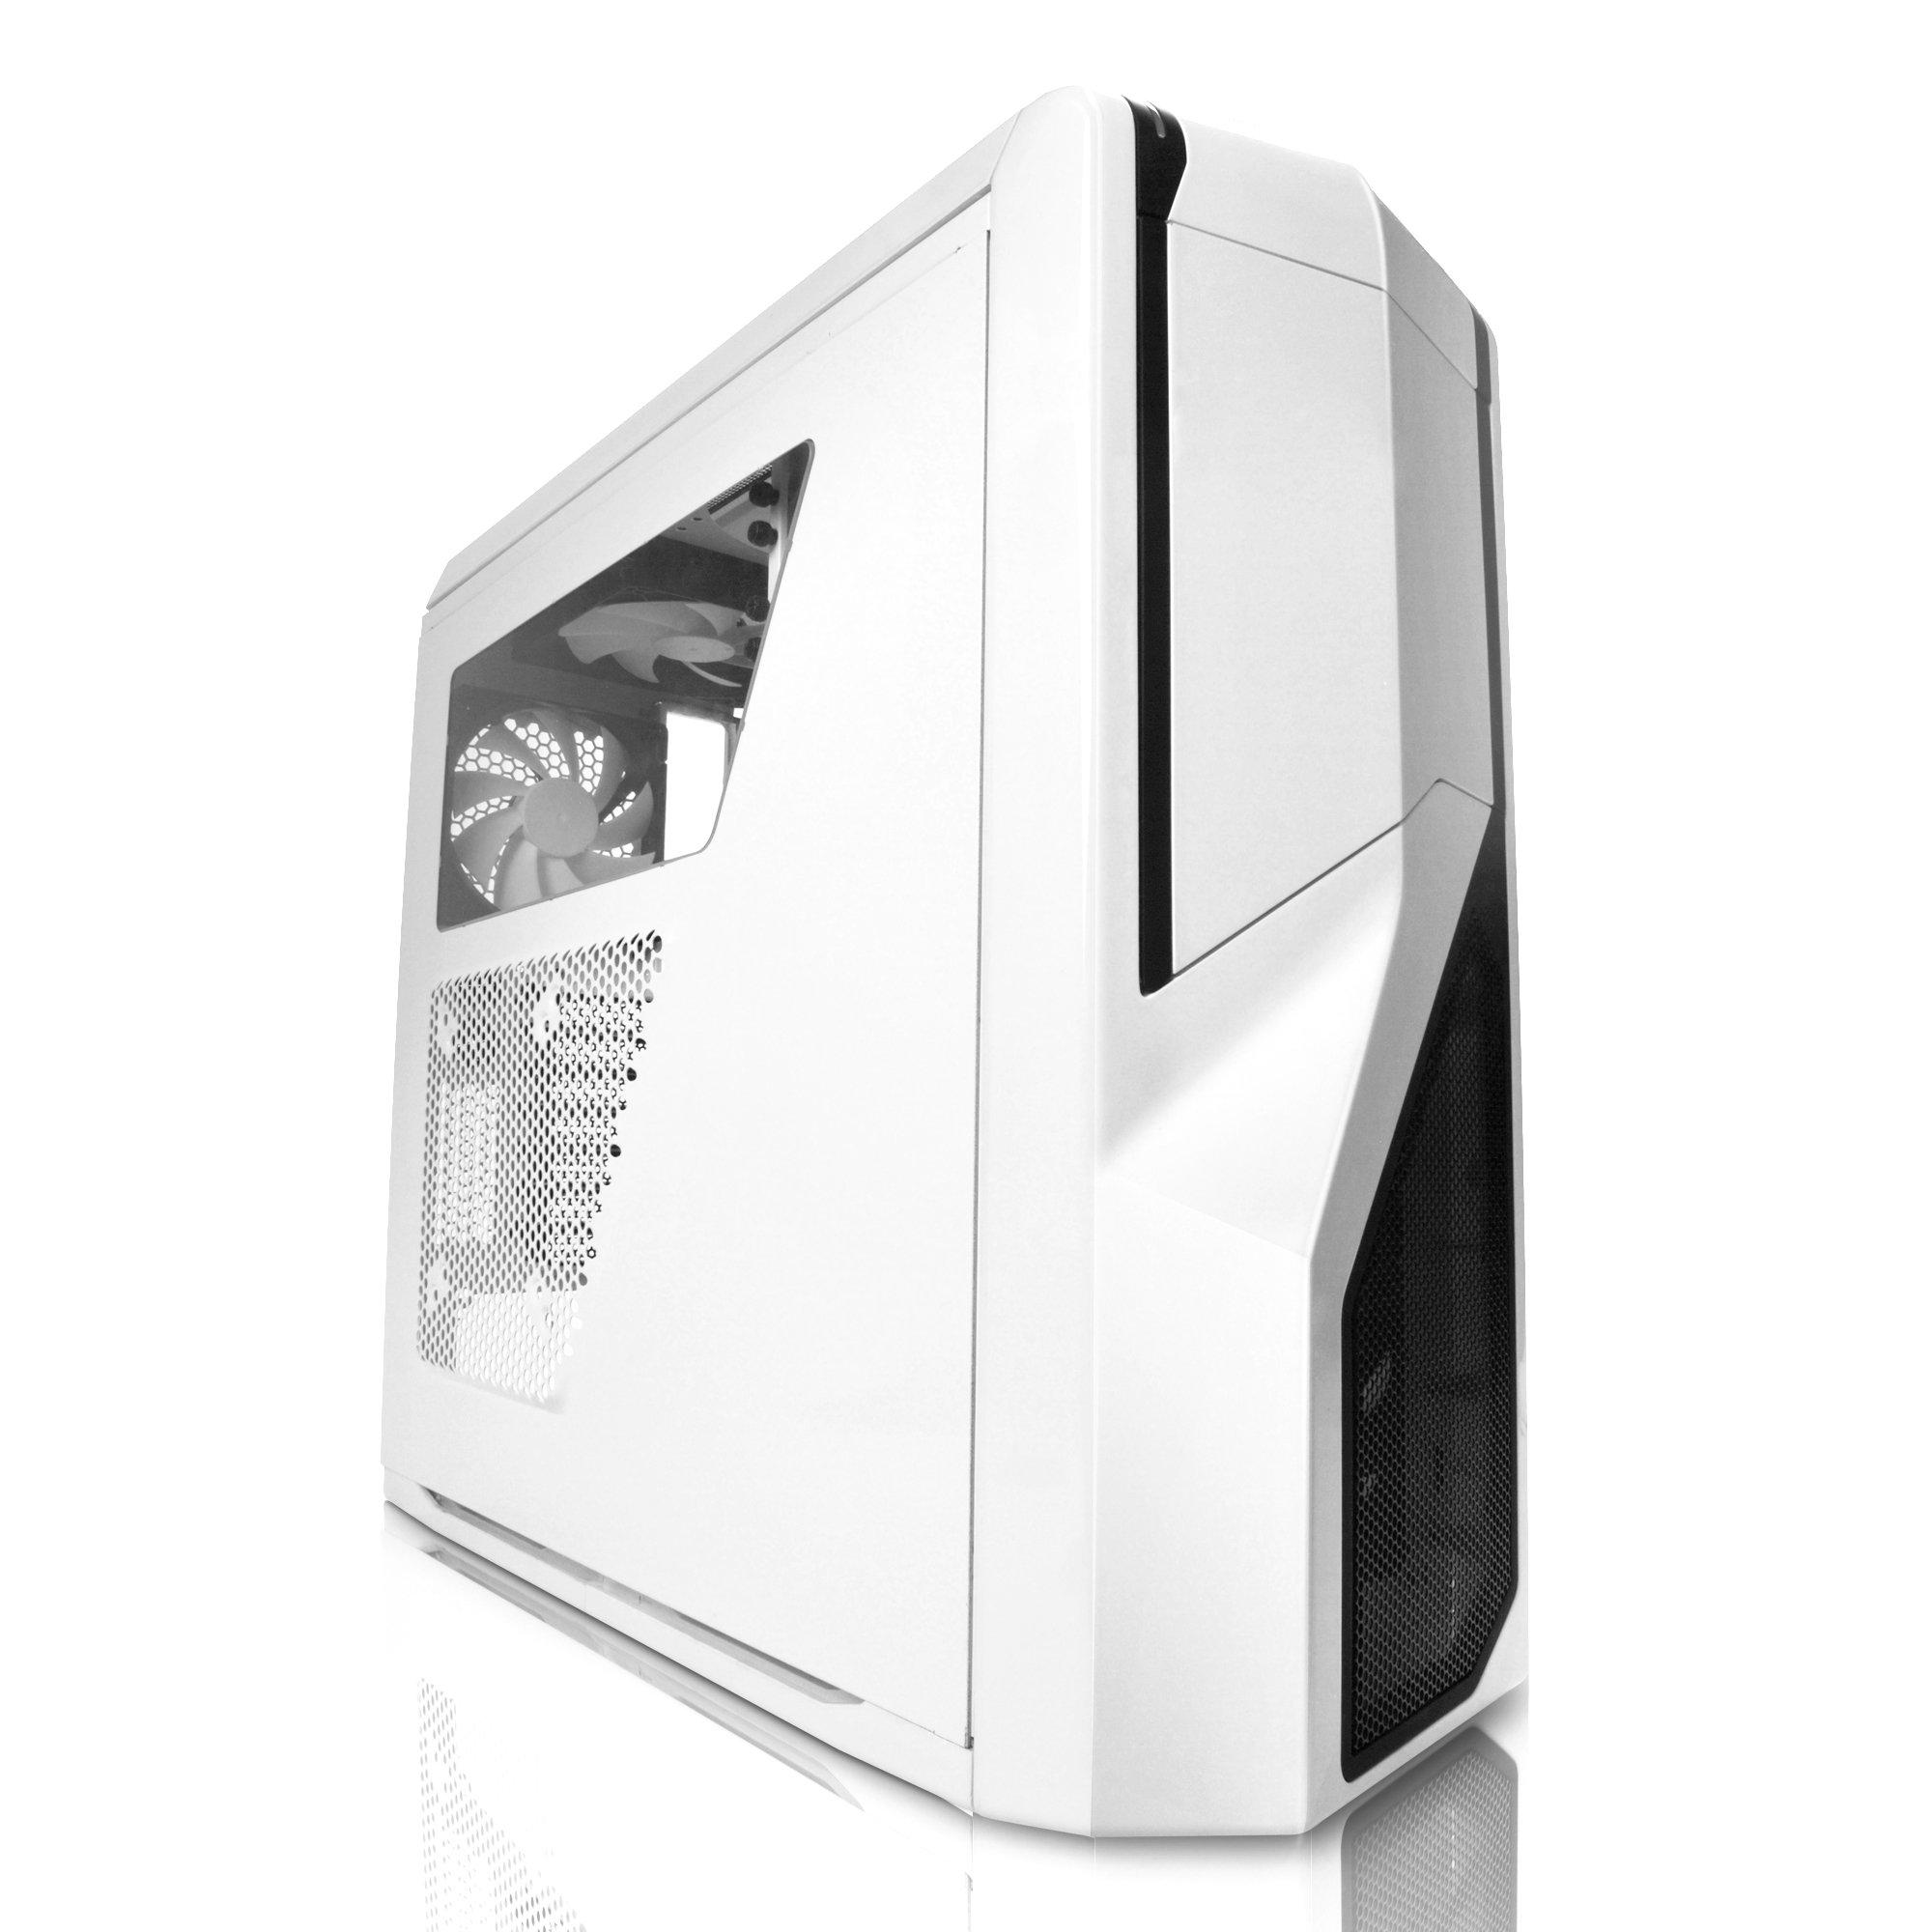 NZXT Phantom 410 Computer Case , White (CA-PH410-W1)